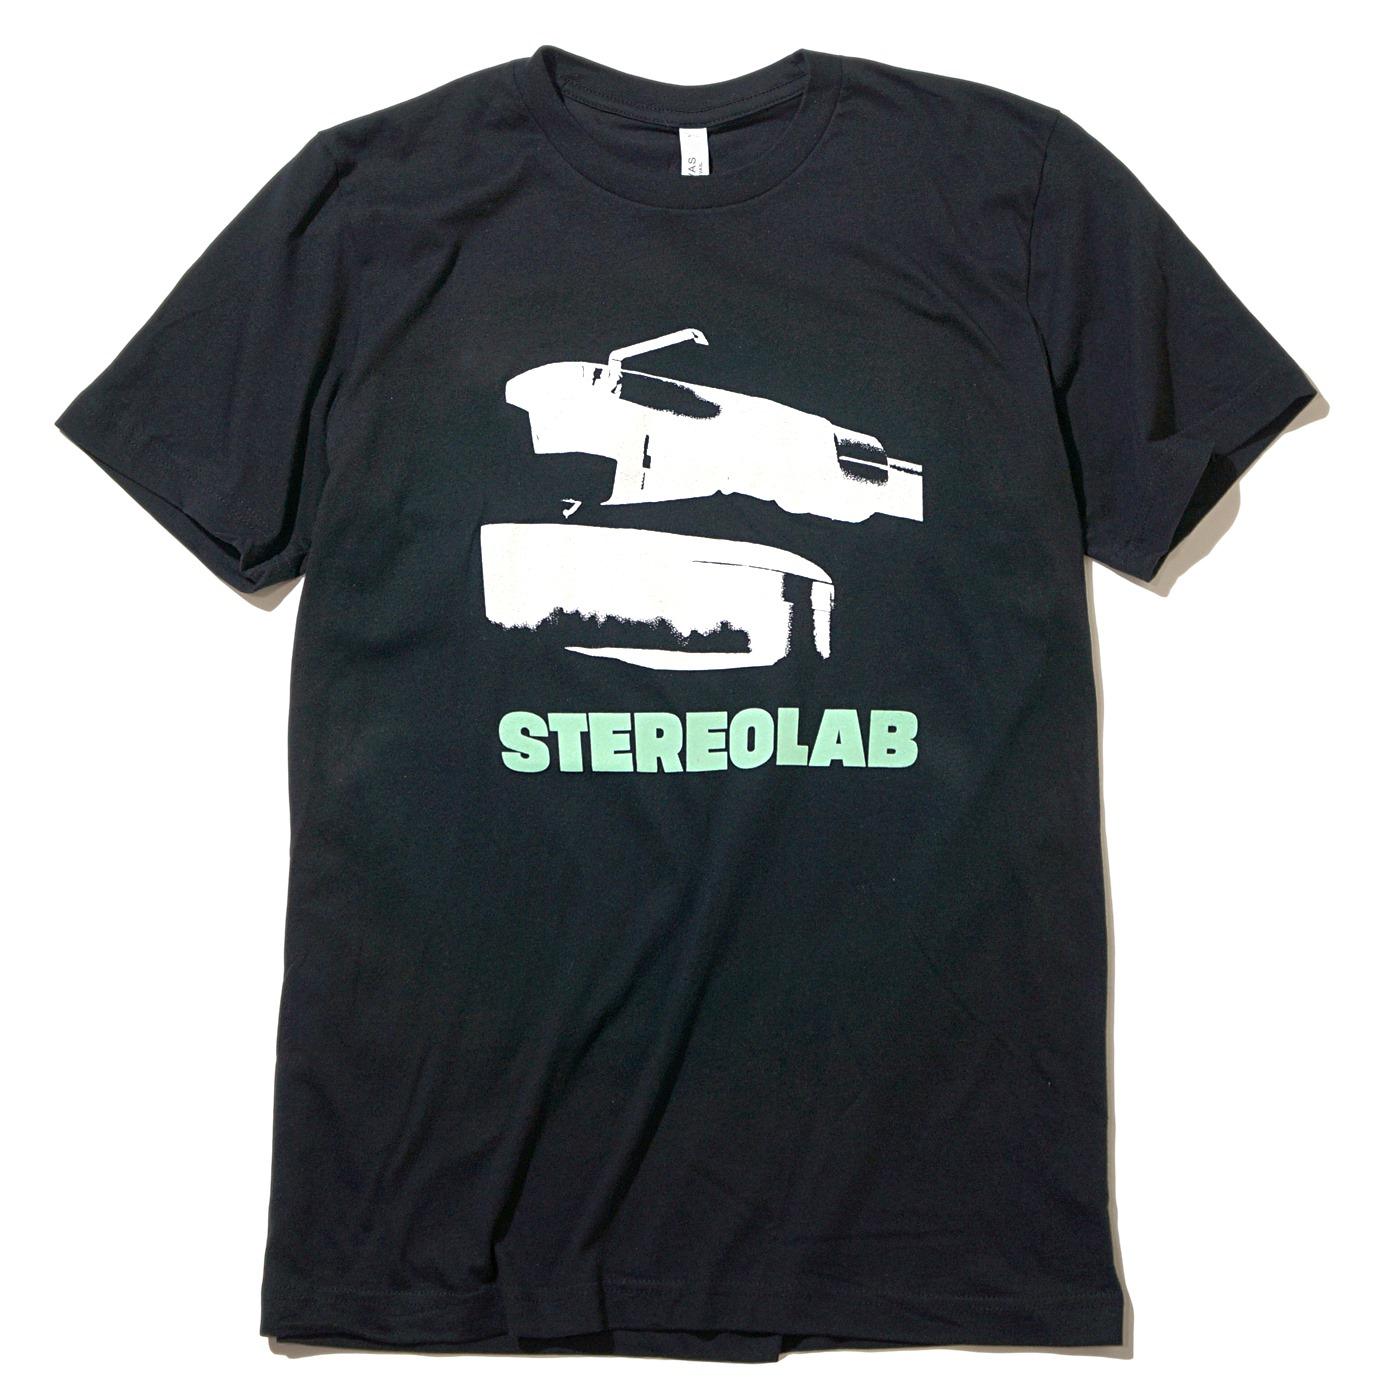 STEREOLAB Tシャツ Transient-Black